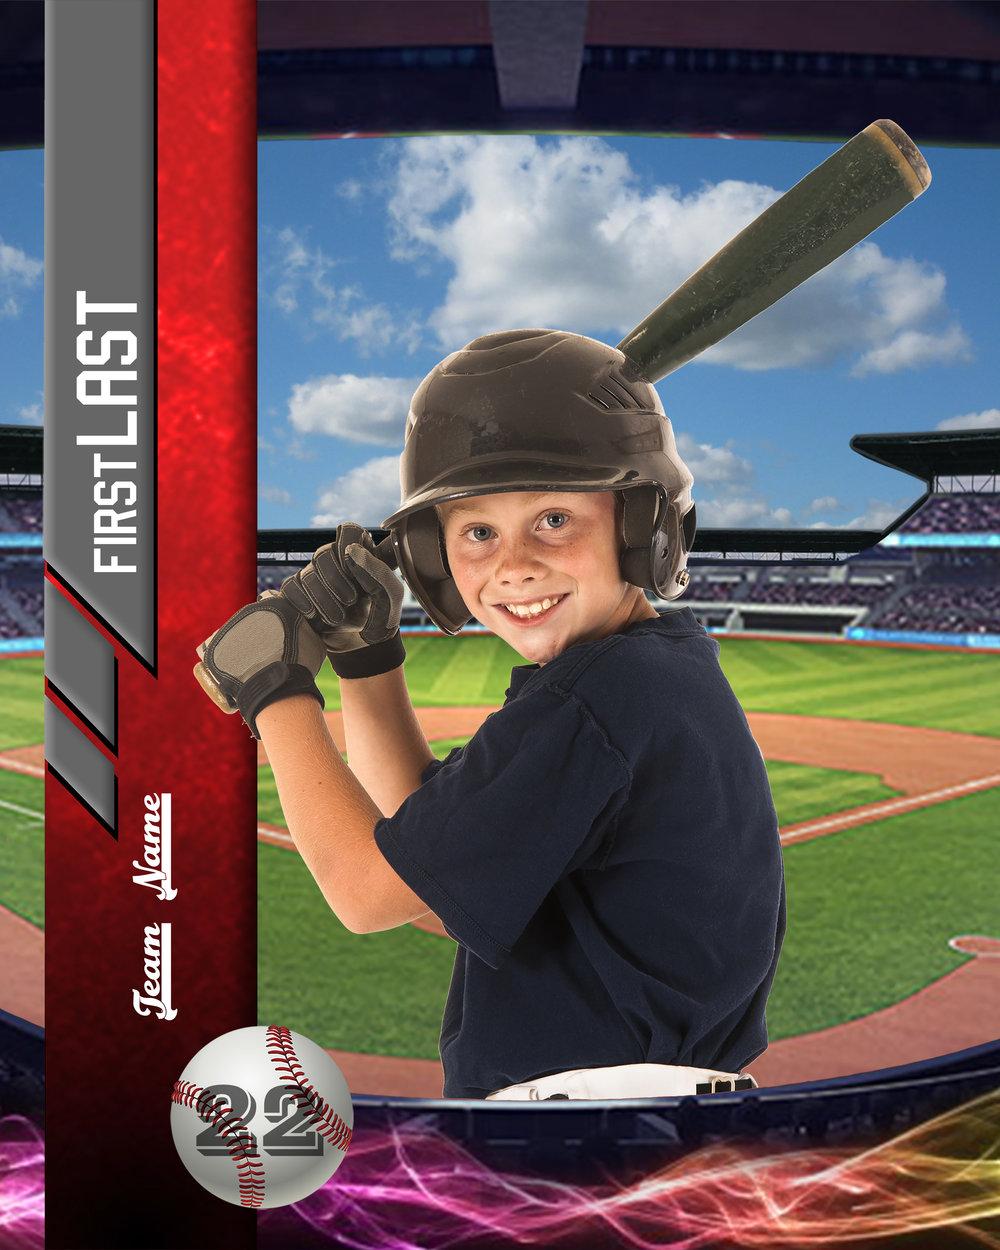 BaseballProject_99design - 3D Red.jpg